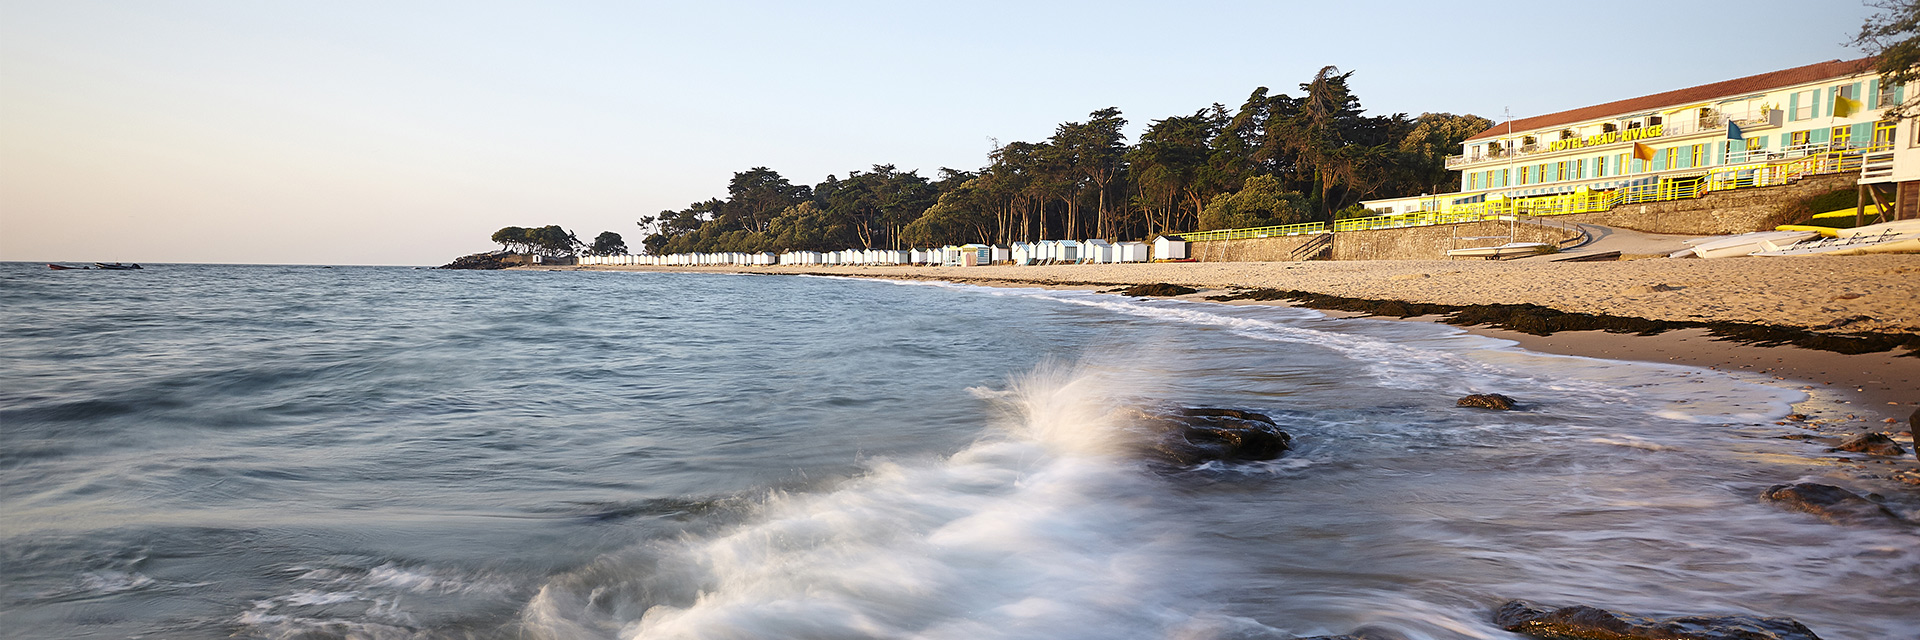 village-vacances-koat-ar-mor-plage